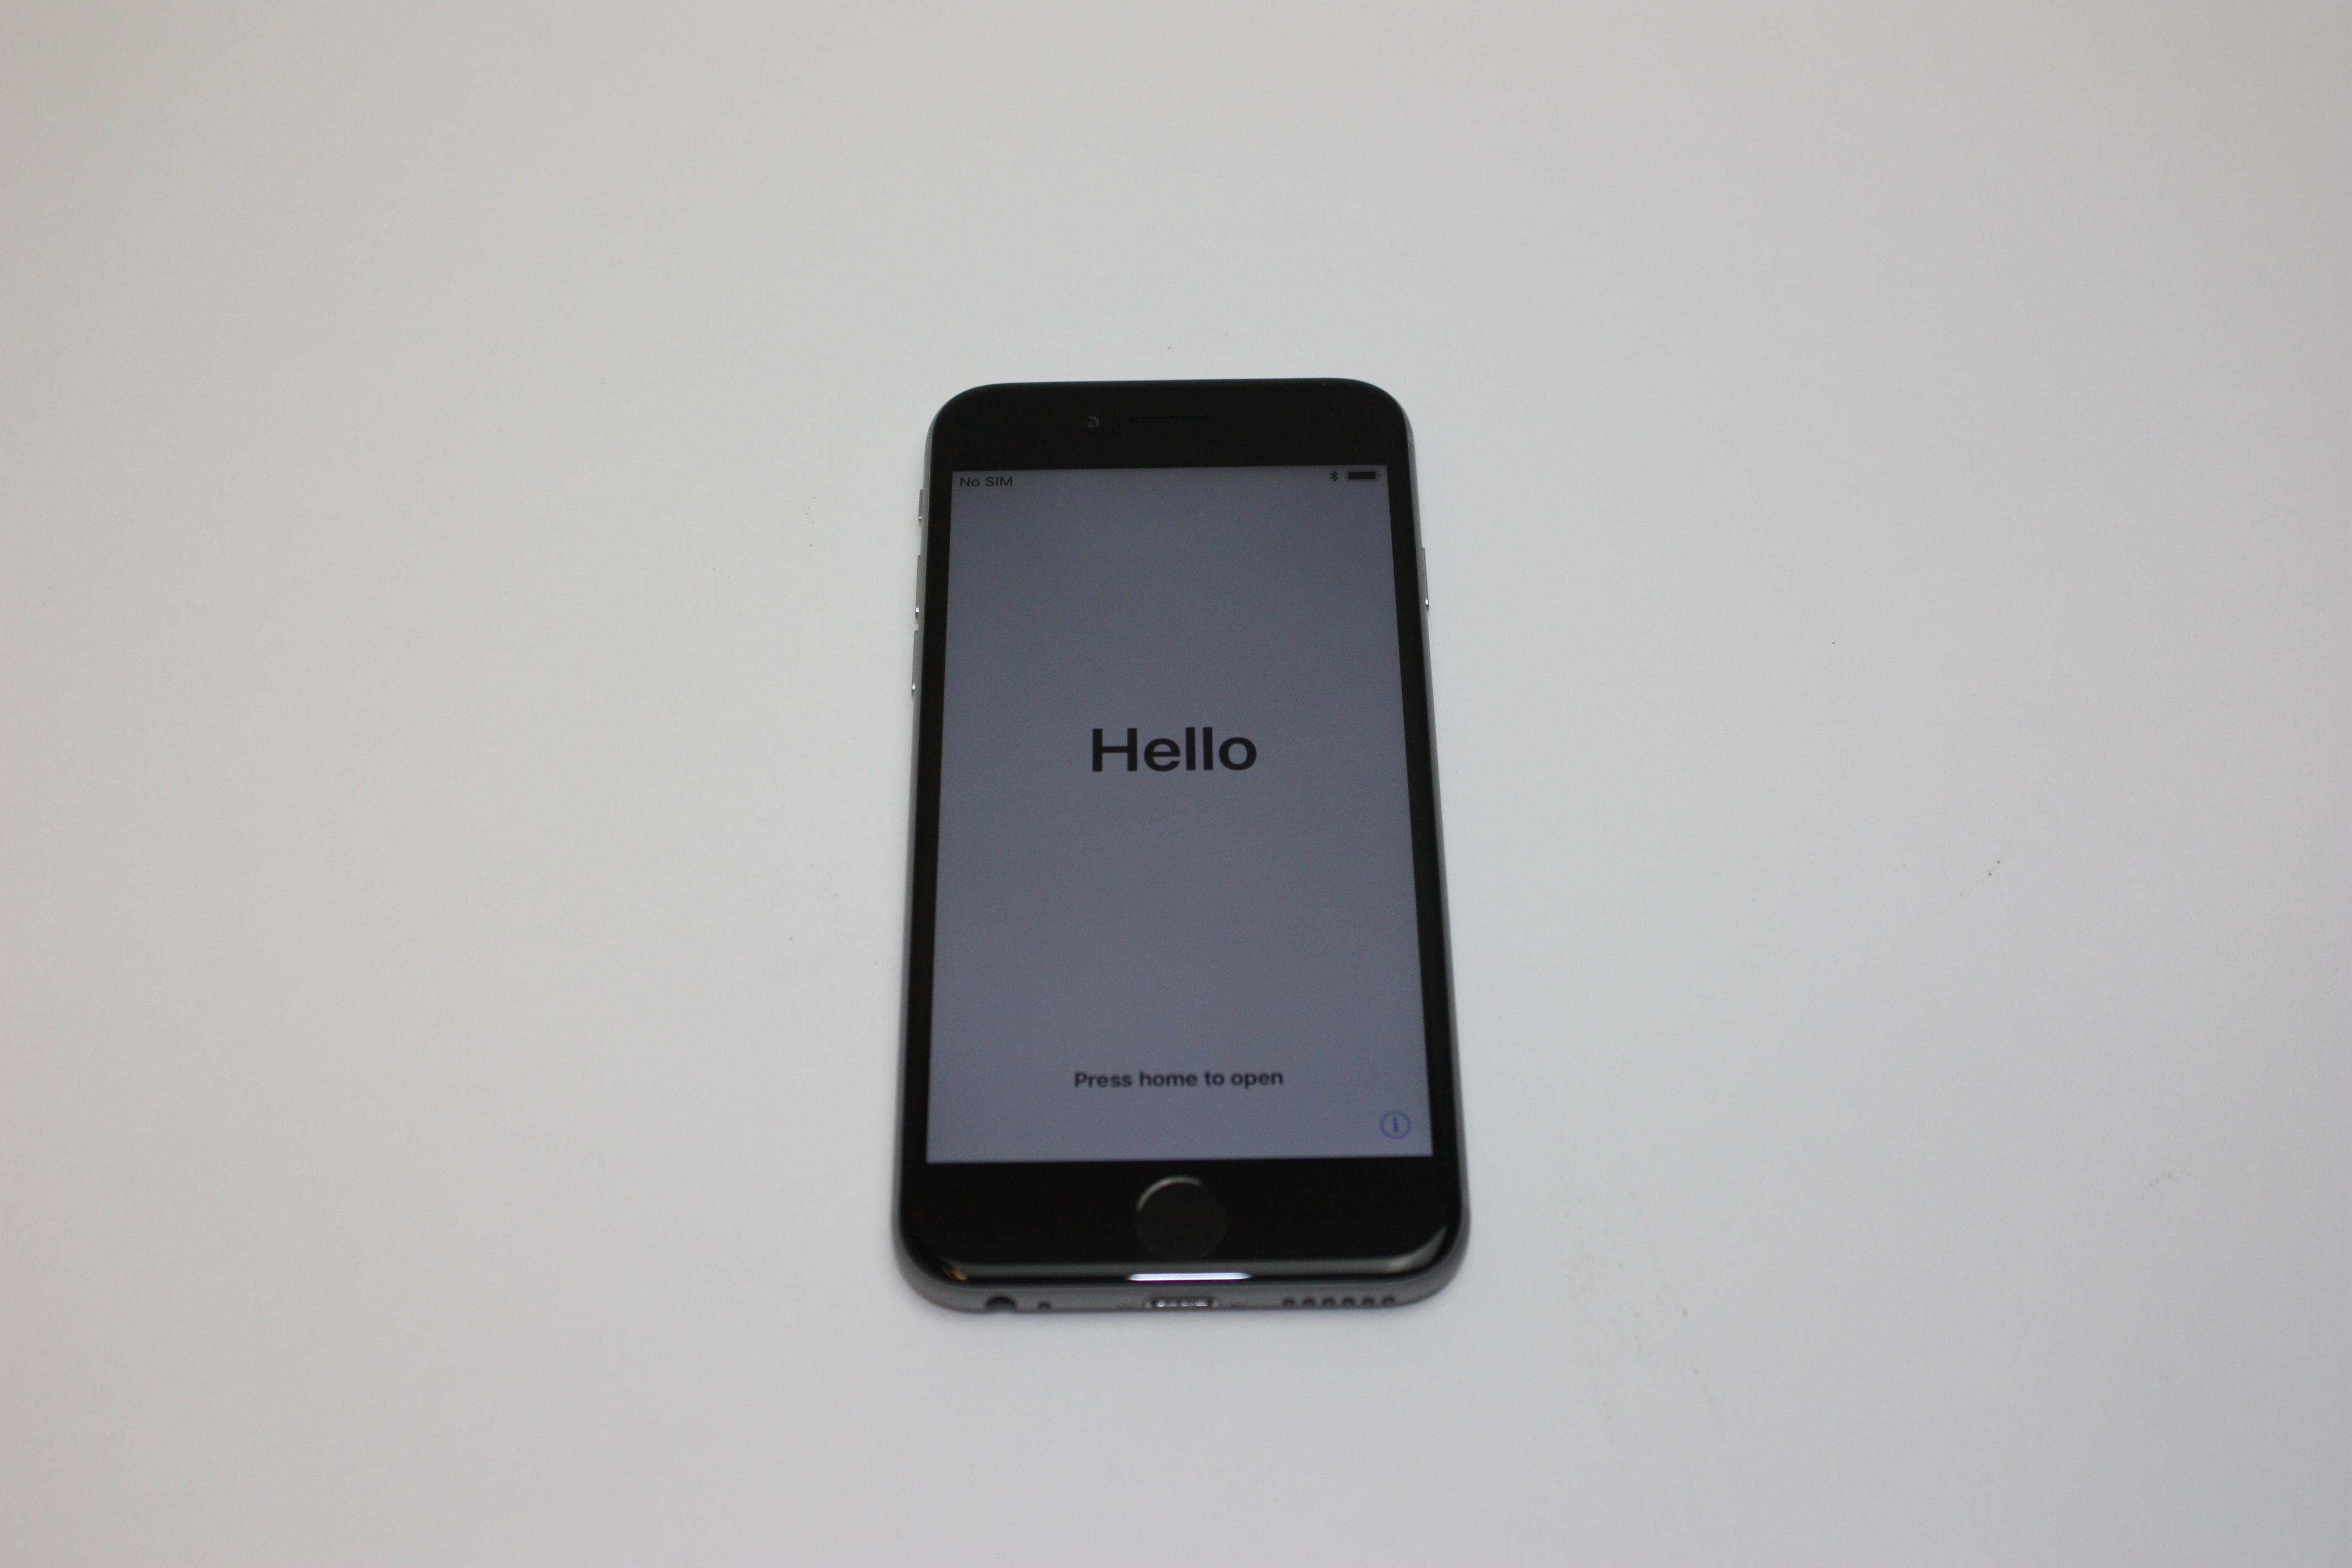 iPhone 6, 16 GB, Space Grey, image 1